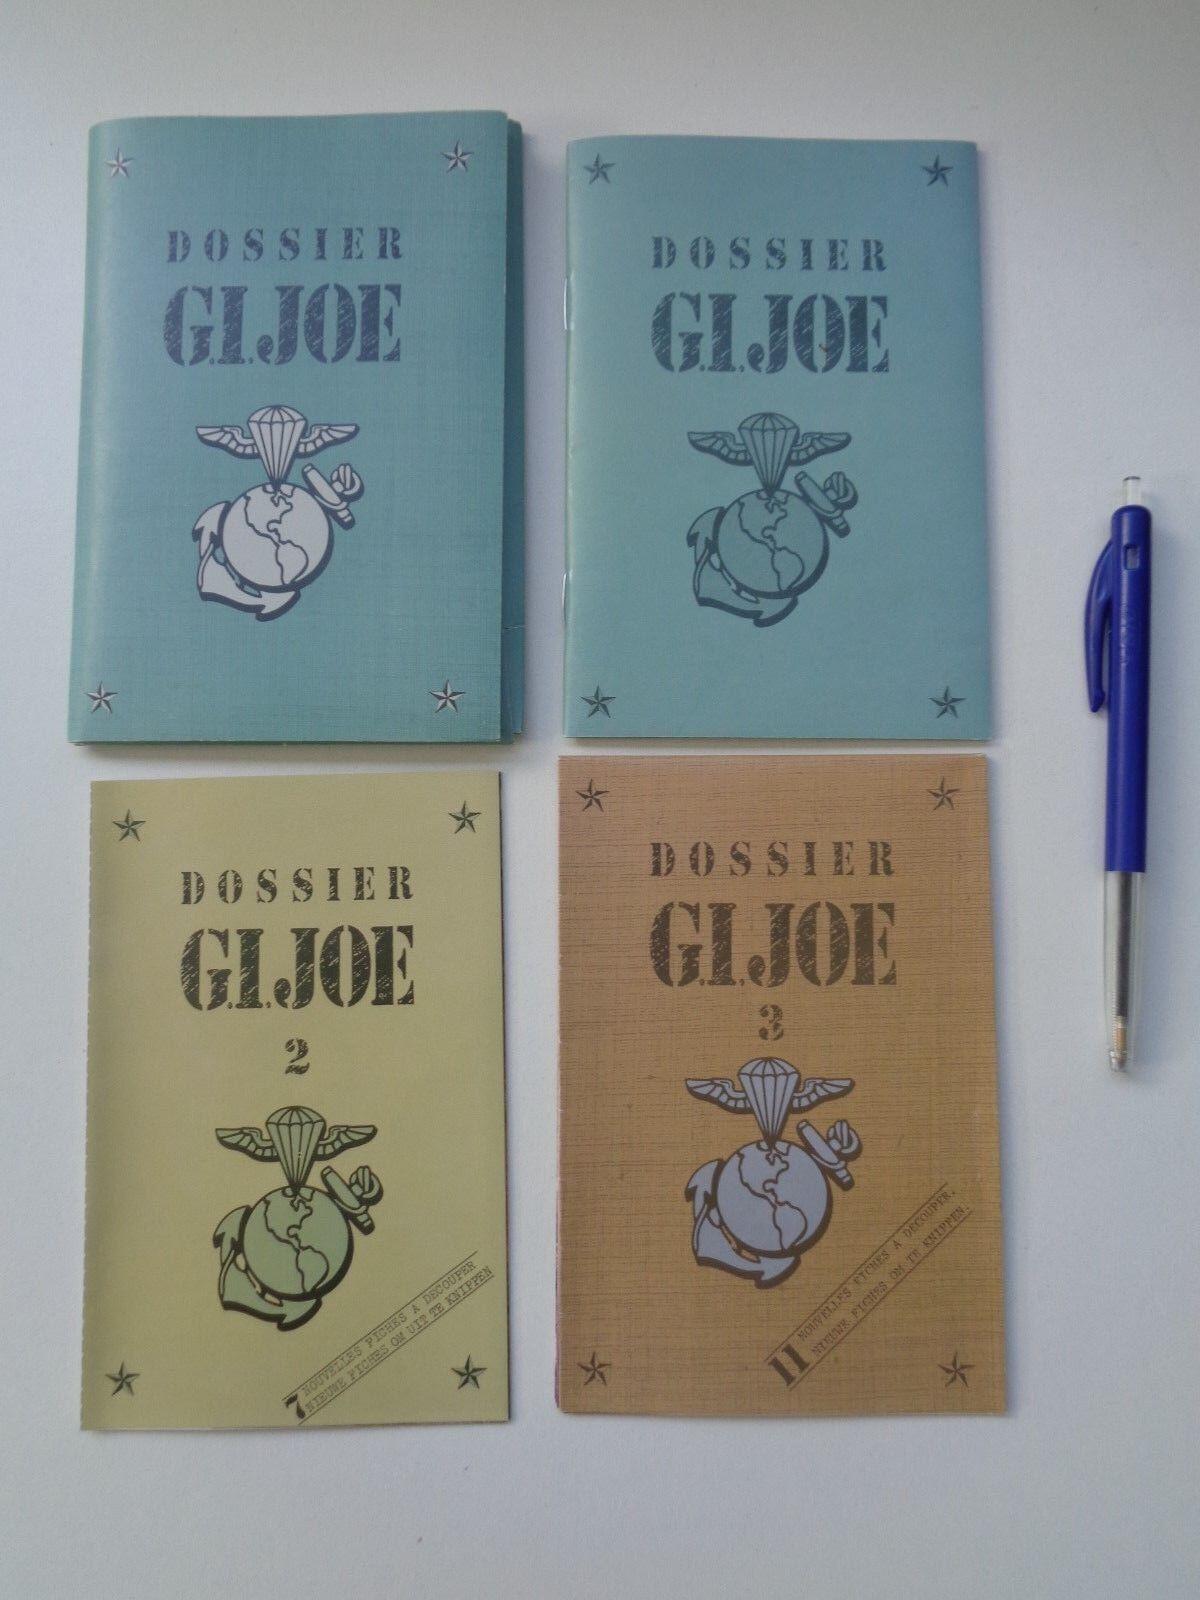 GI JOE BELGIAN CATALOG FOLDER BOOKLET FAN CLUB CLUB CLUB DOSSIER 1,2,3 COMPLETE FR NL 5d833d